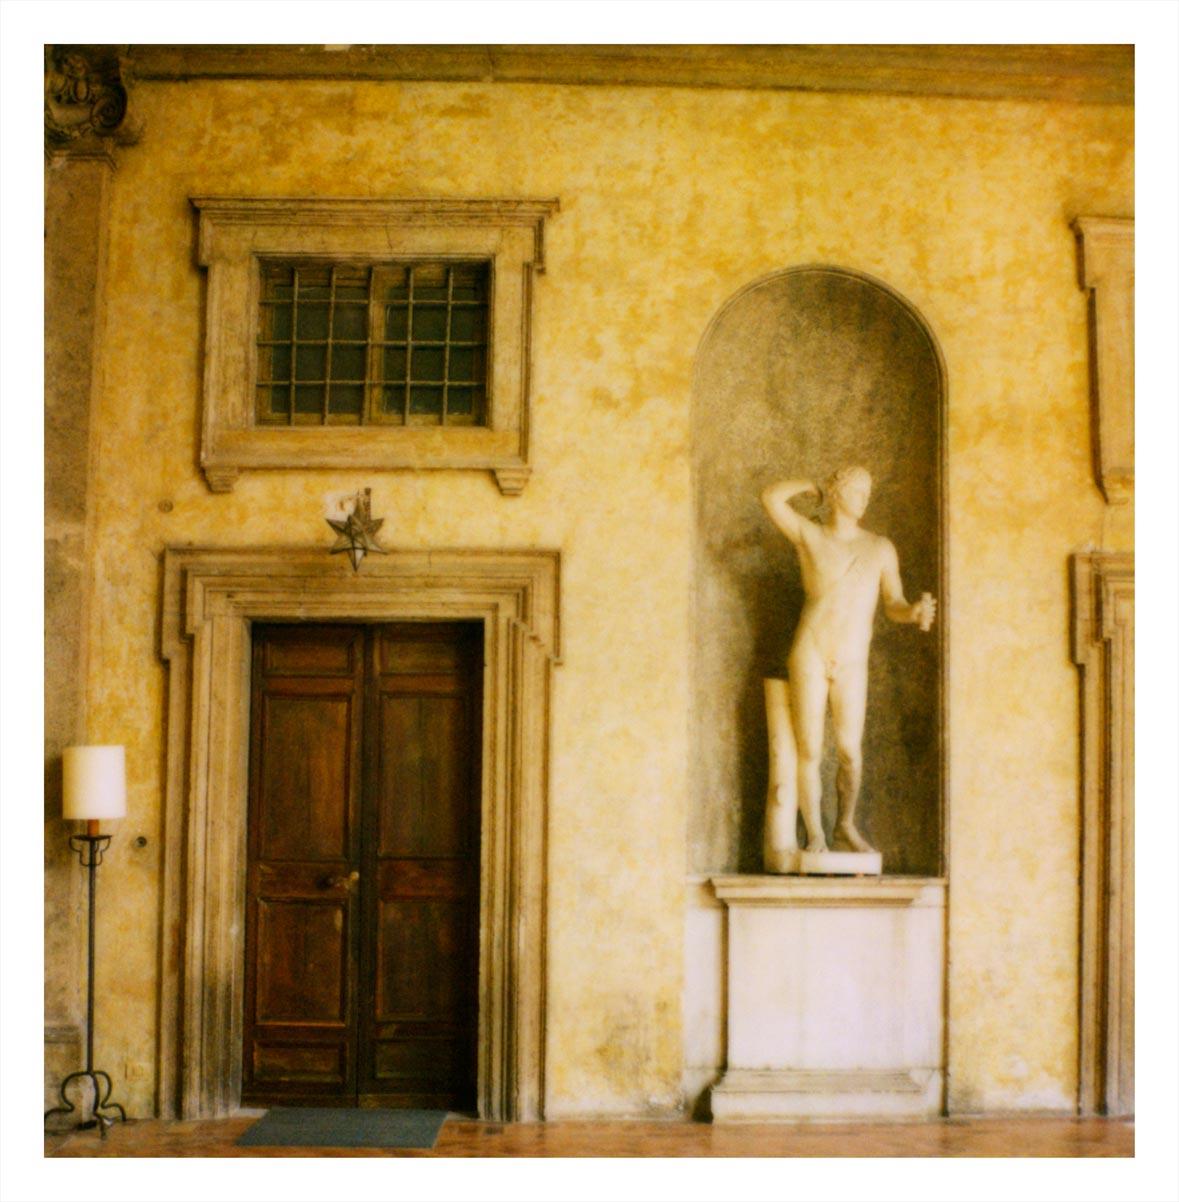 Grand-Tour-Cinecitta-Villa-Medicis-Rome-François-Halard-017